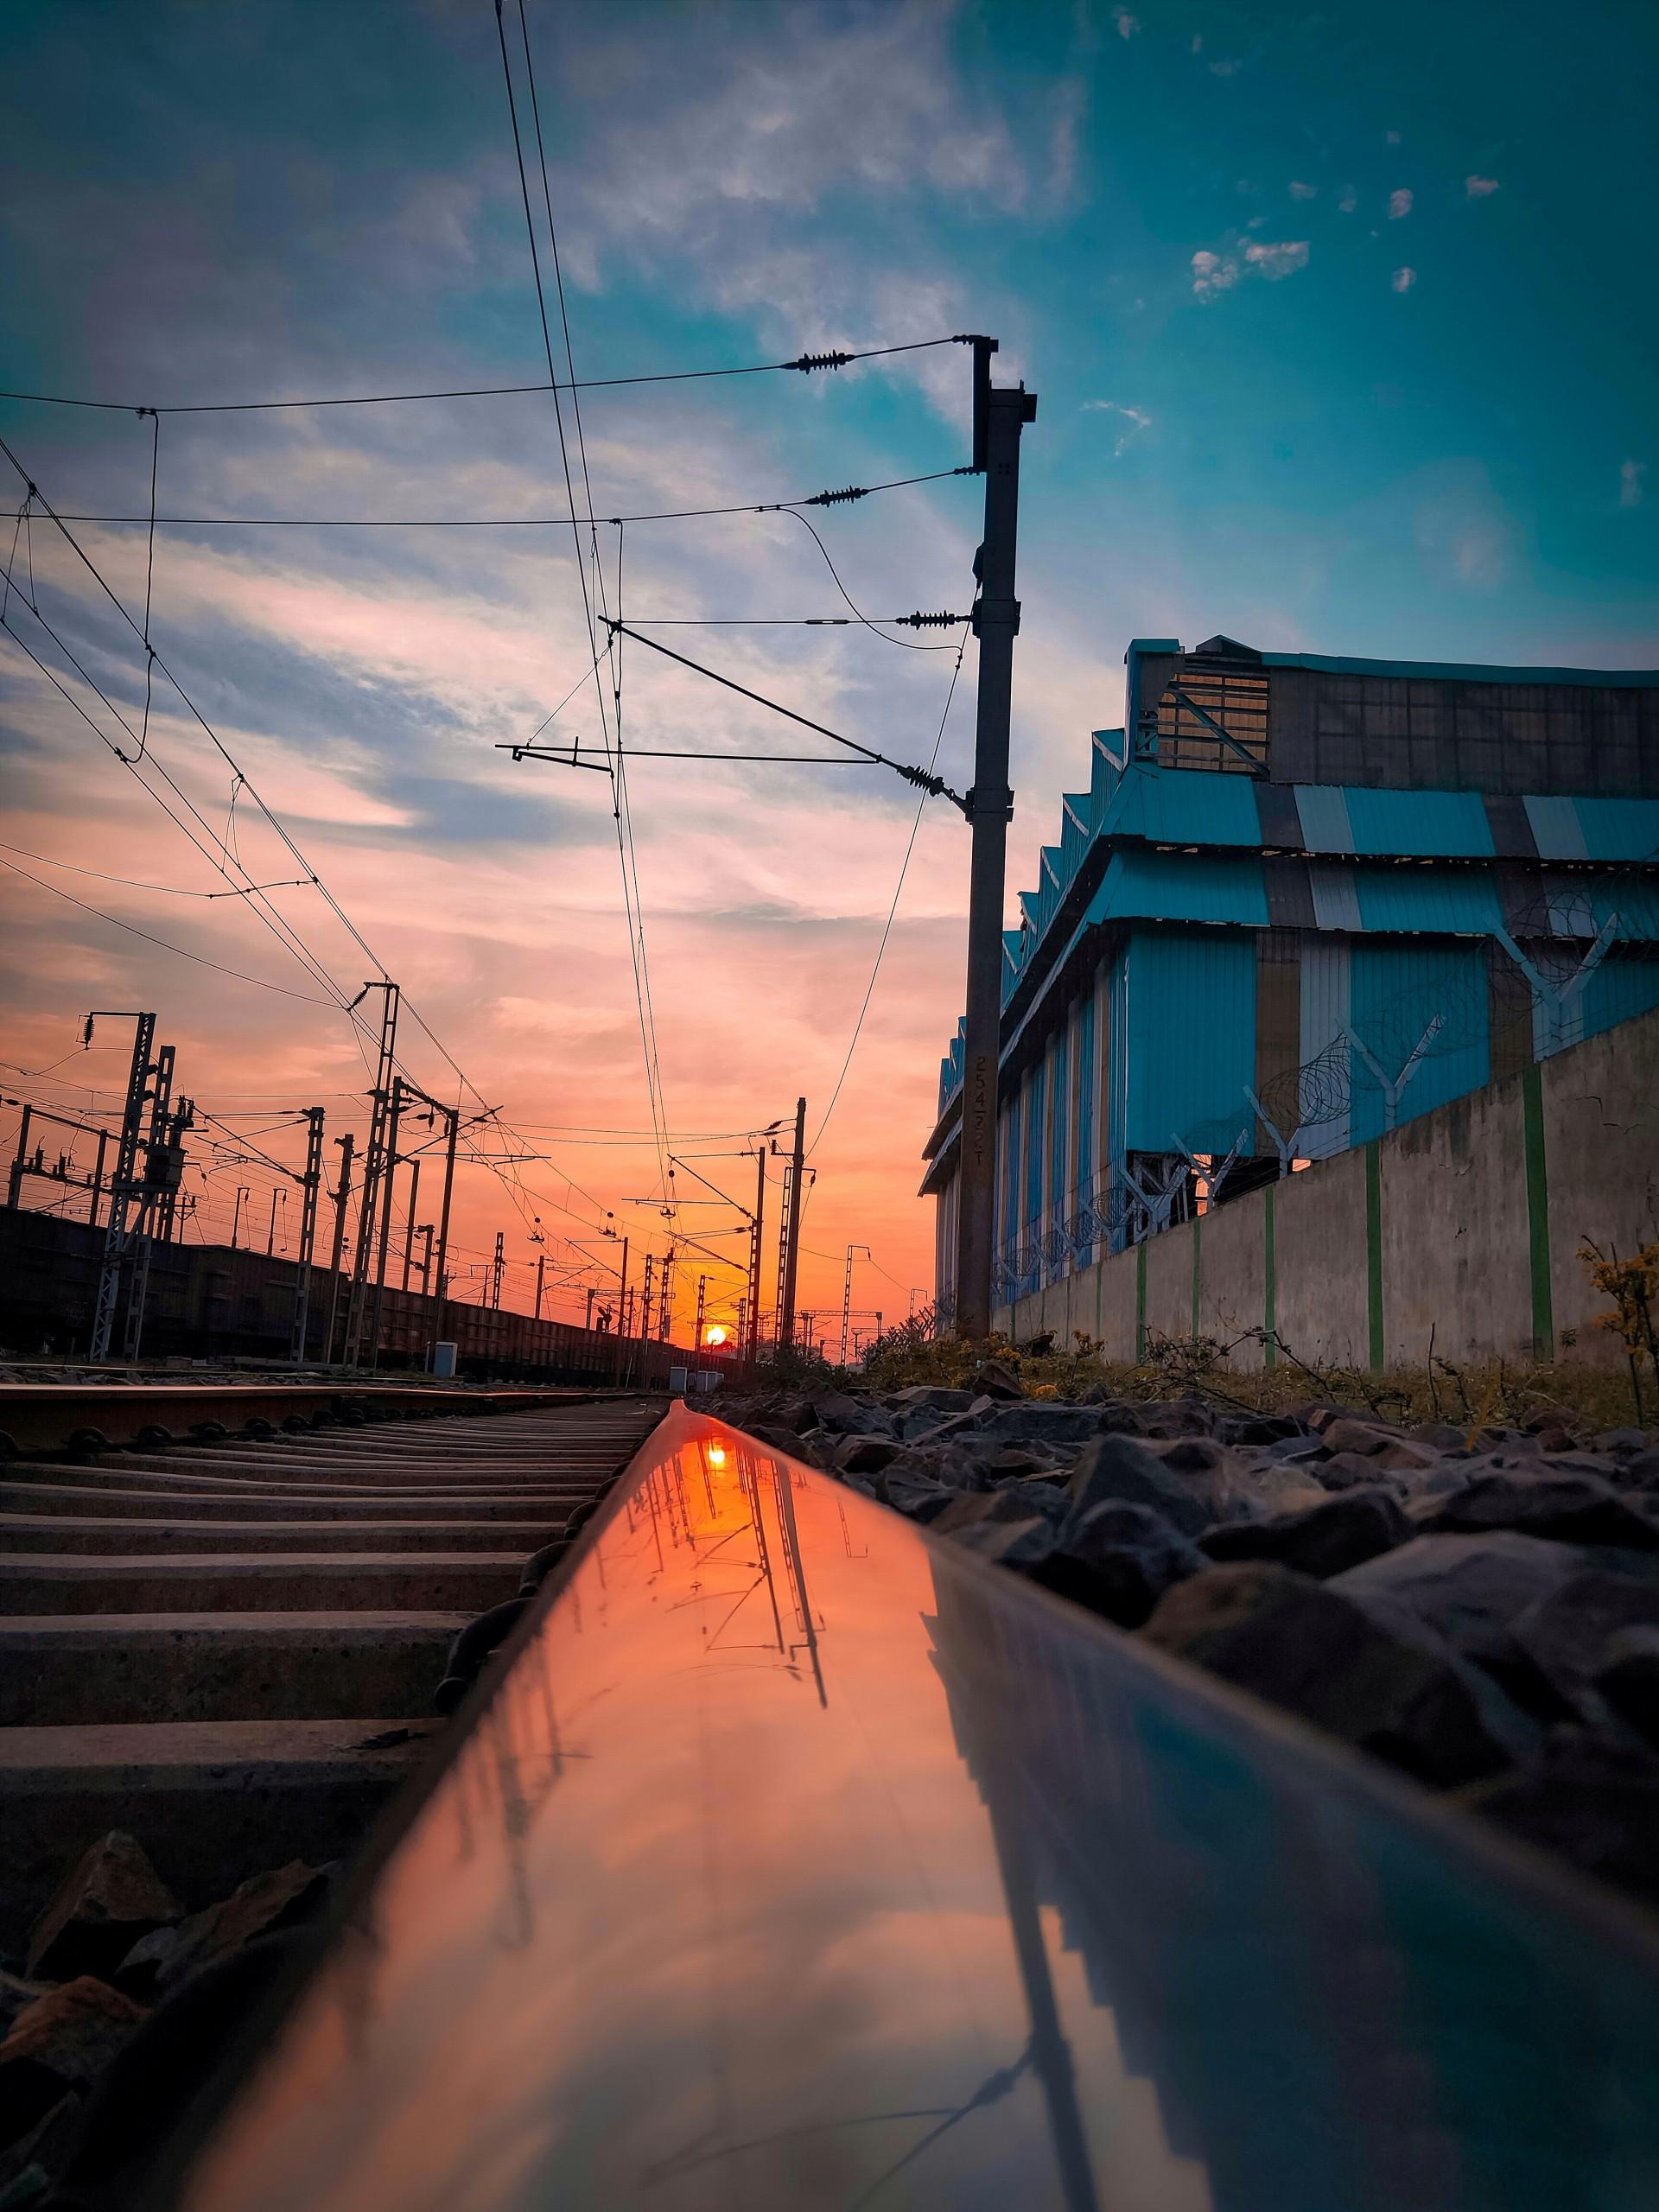 Sunset at Railway Line